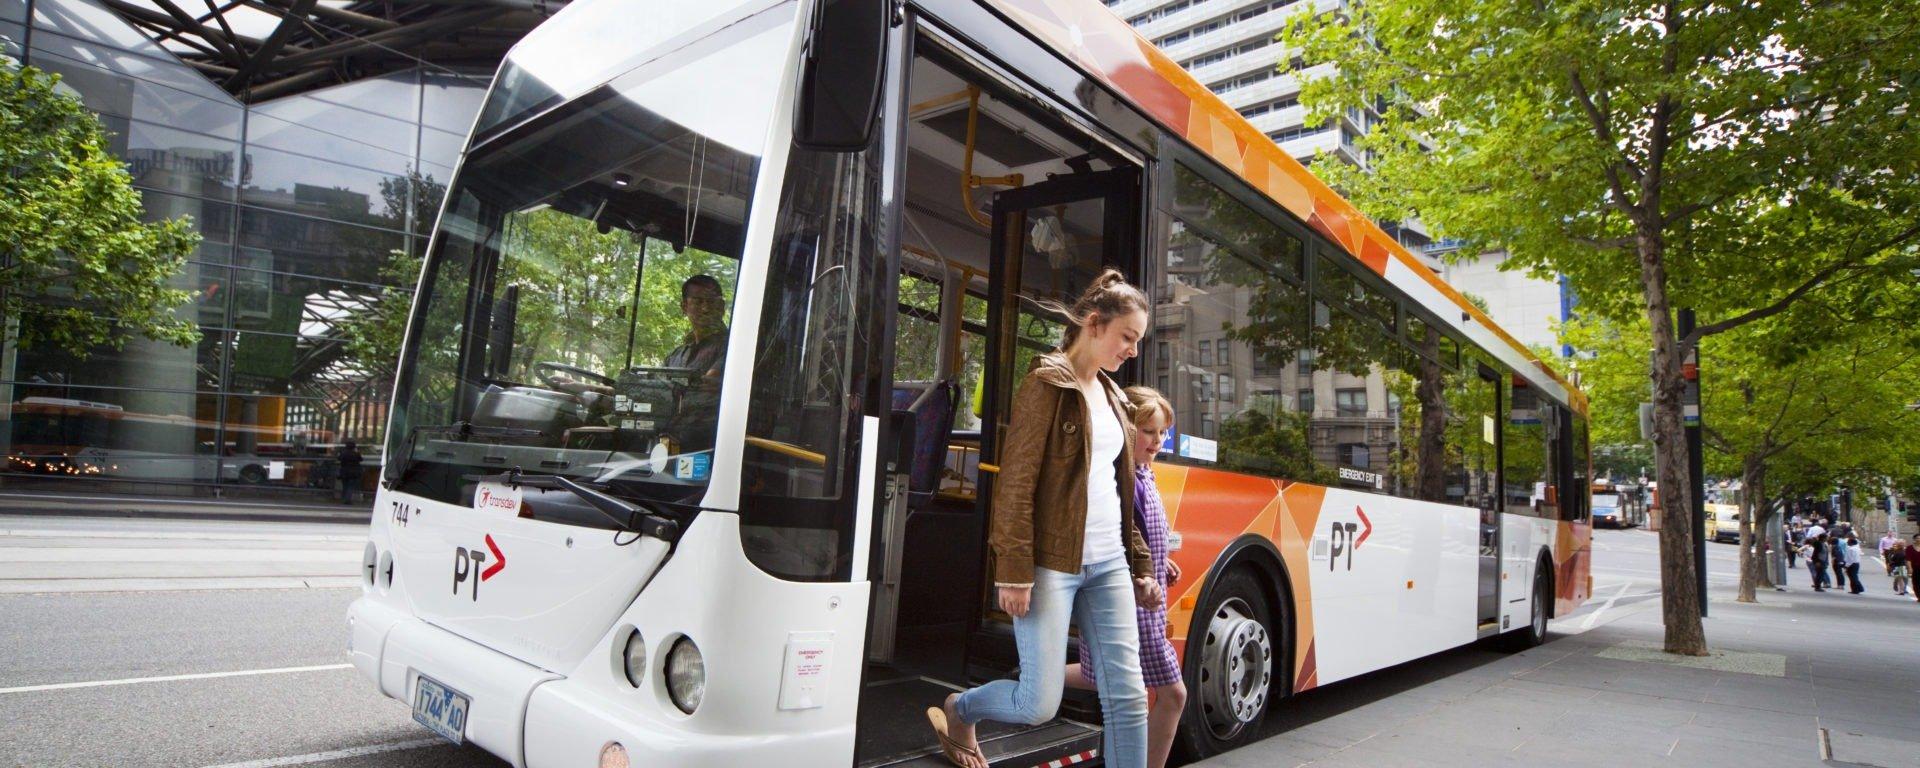 transdev-mobility-bus-services